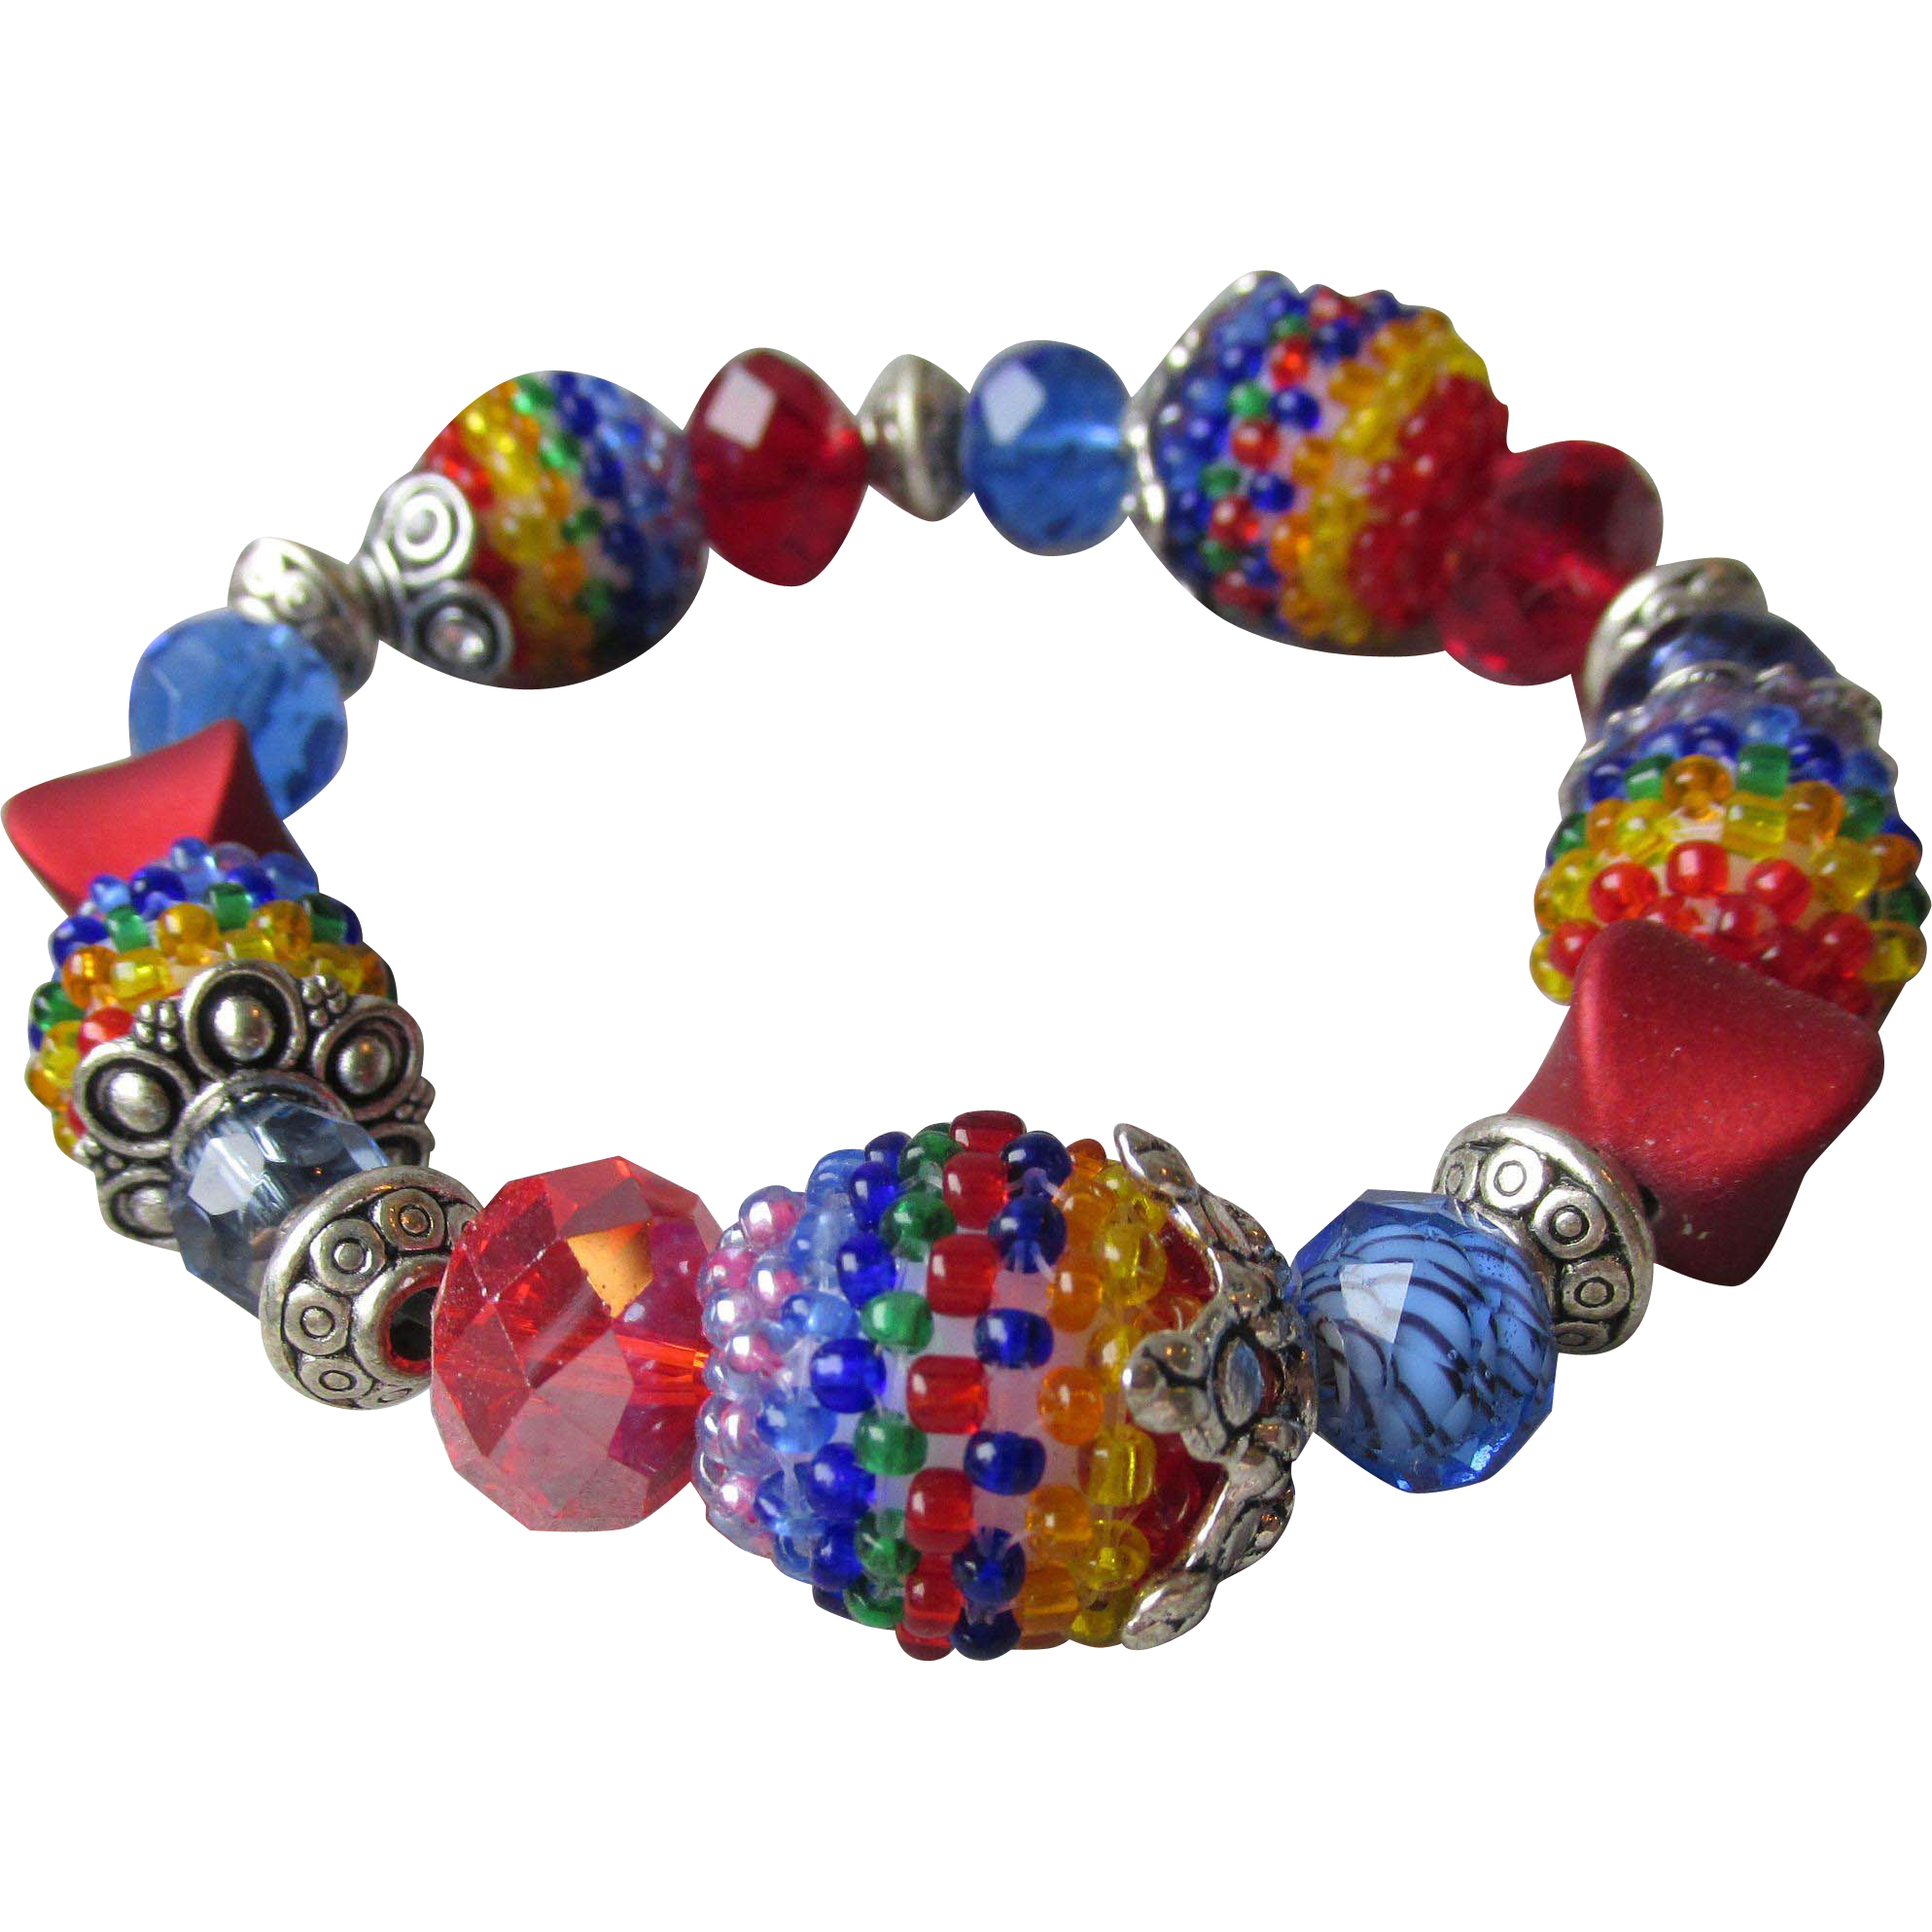 """My Secret Garden"" Lampwork Art Glass Bead Artisan Stretch Bracelet, ""Harlequin"" #B2"